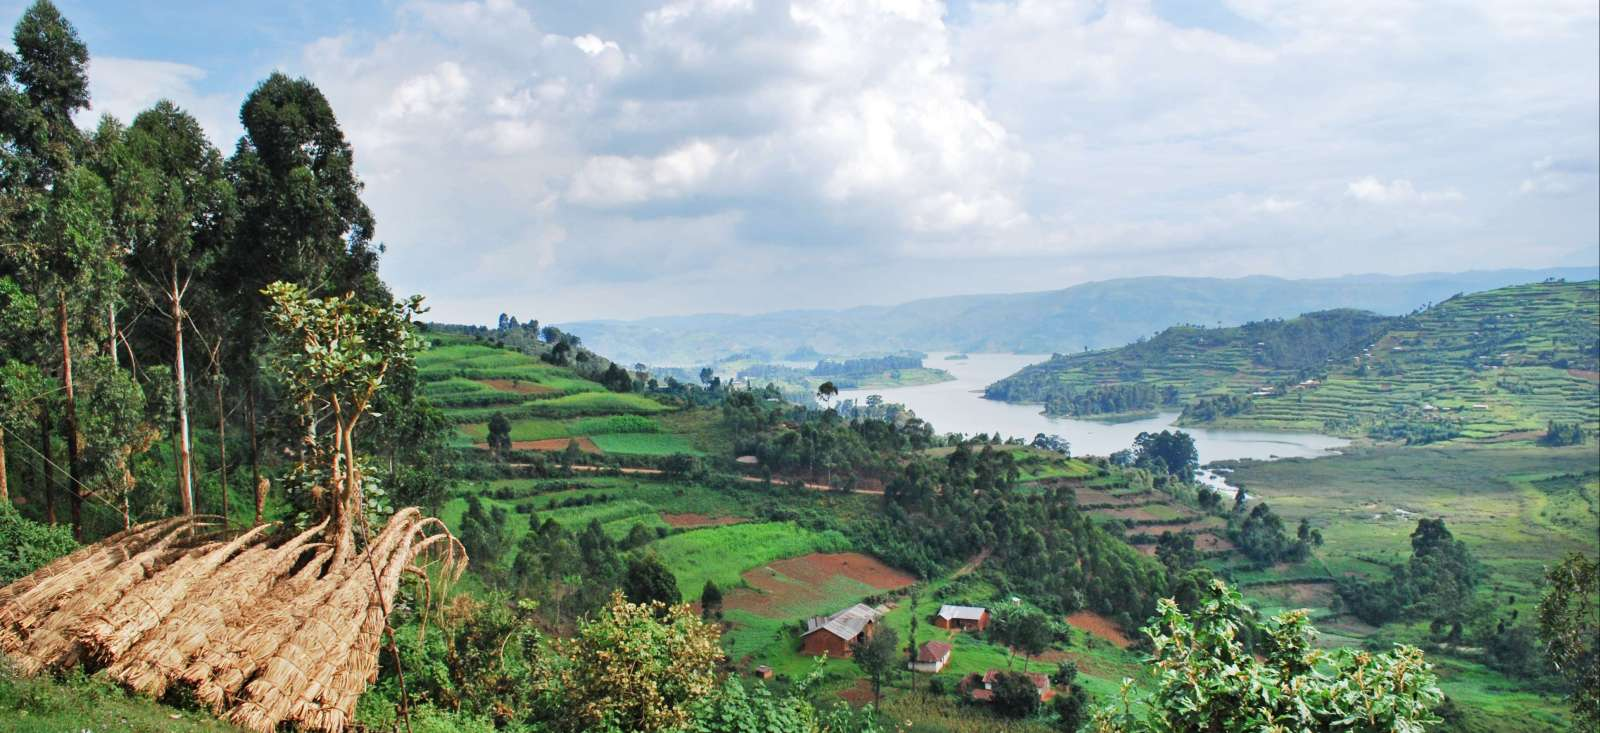 Voyage à pied Ouganda : Best of Ouganda